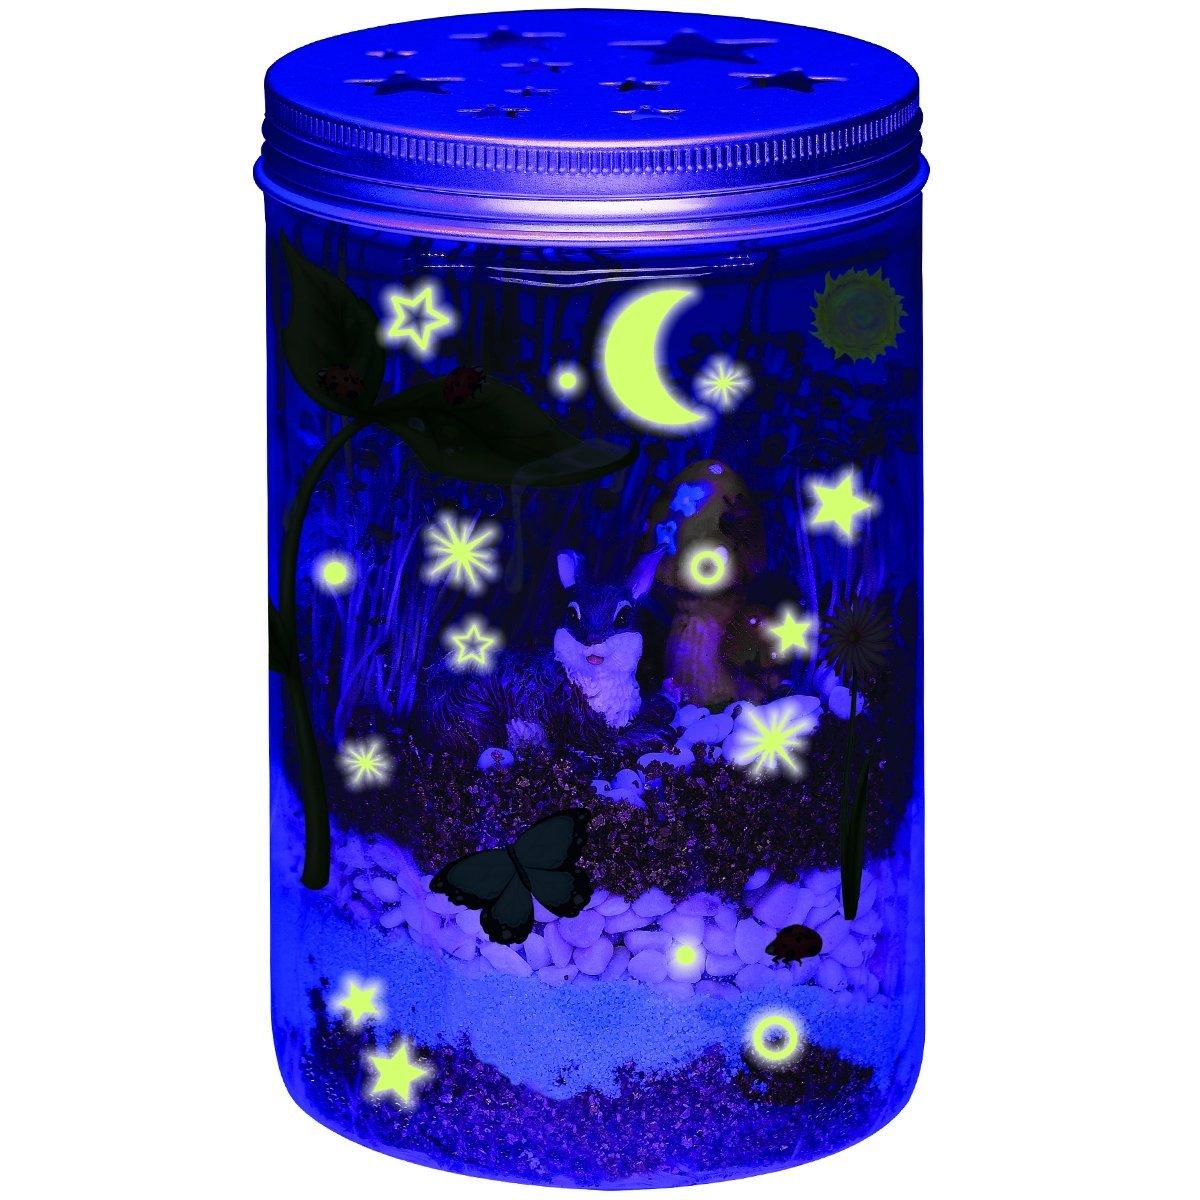 Creativity for kids grow  n glow terrarium 4